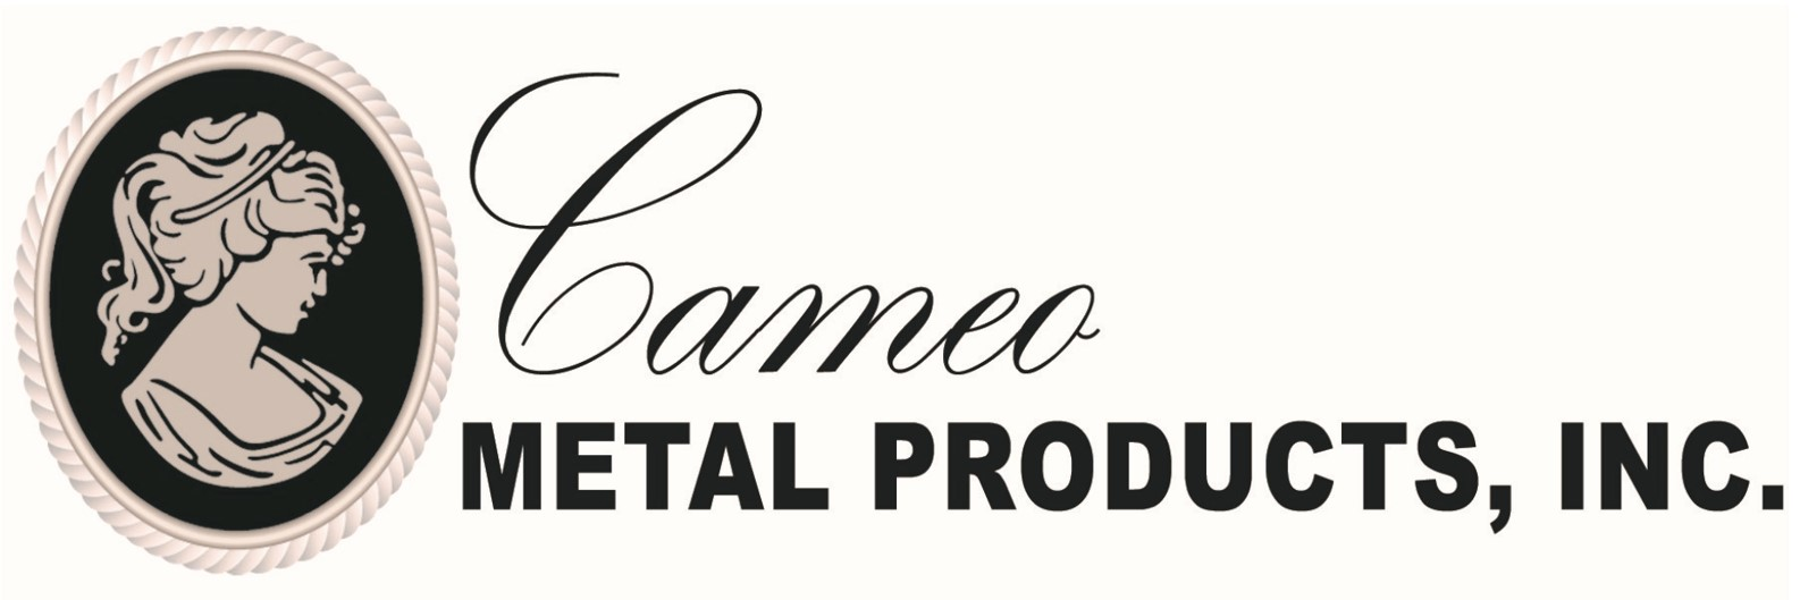 Logo CAMEO METAL PRODUCTS, INC.